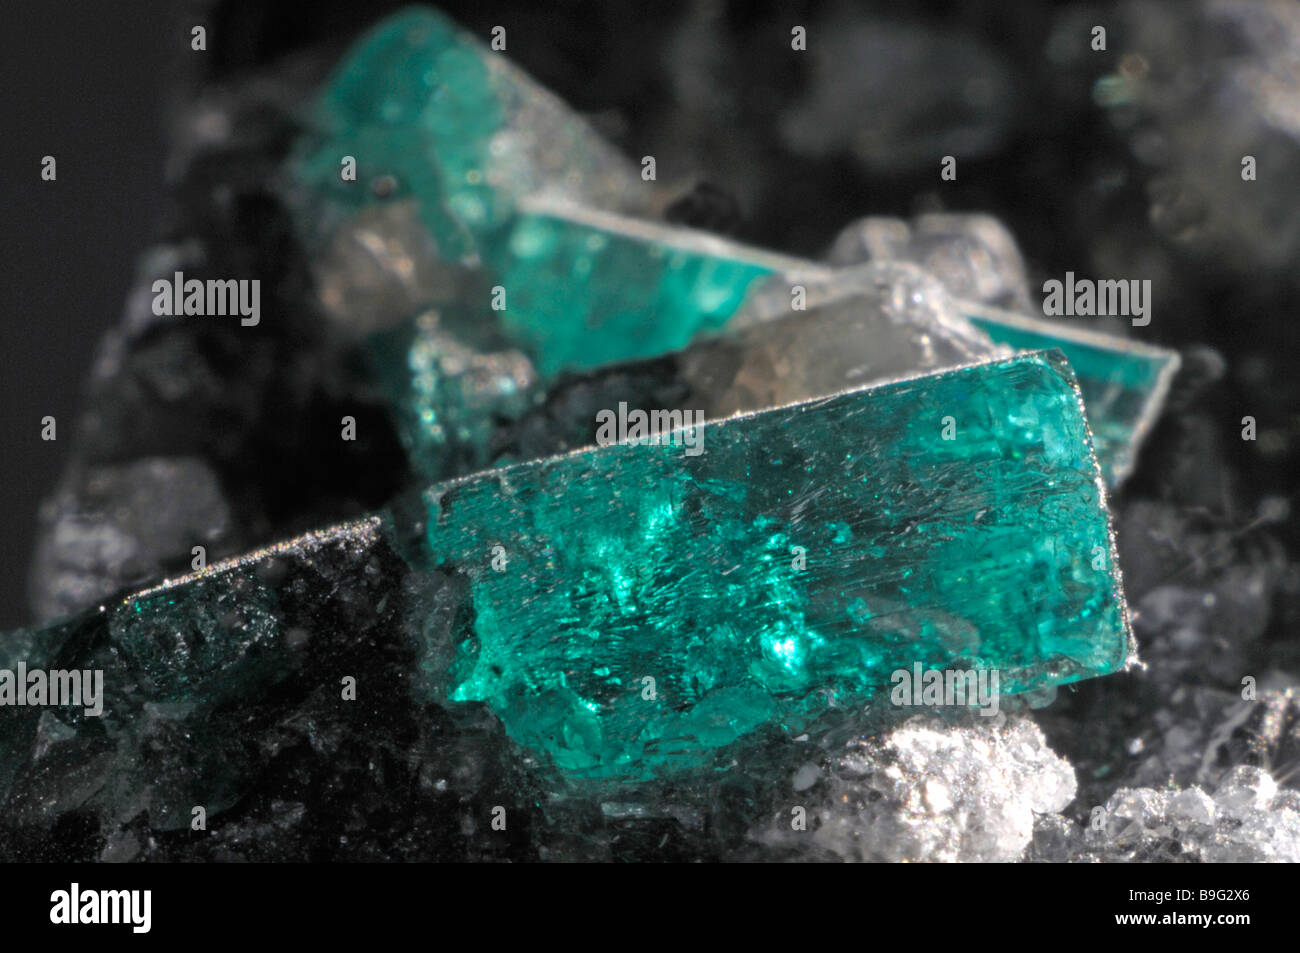 Emerald, crystals in rock - Stock Image